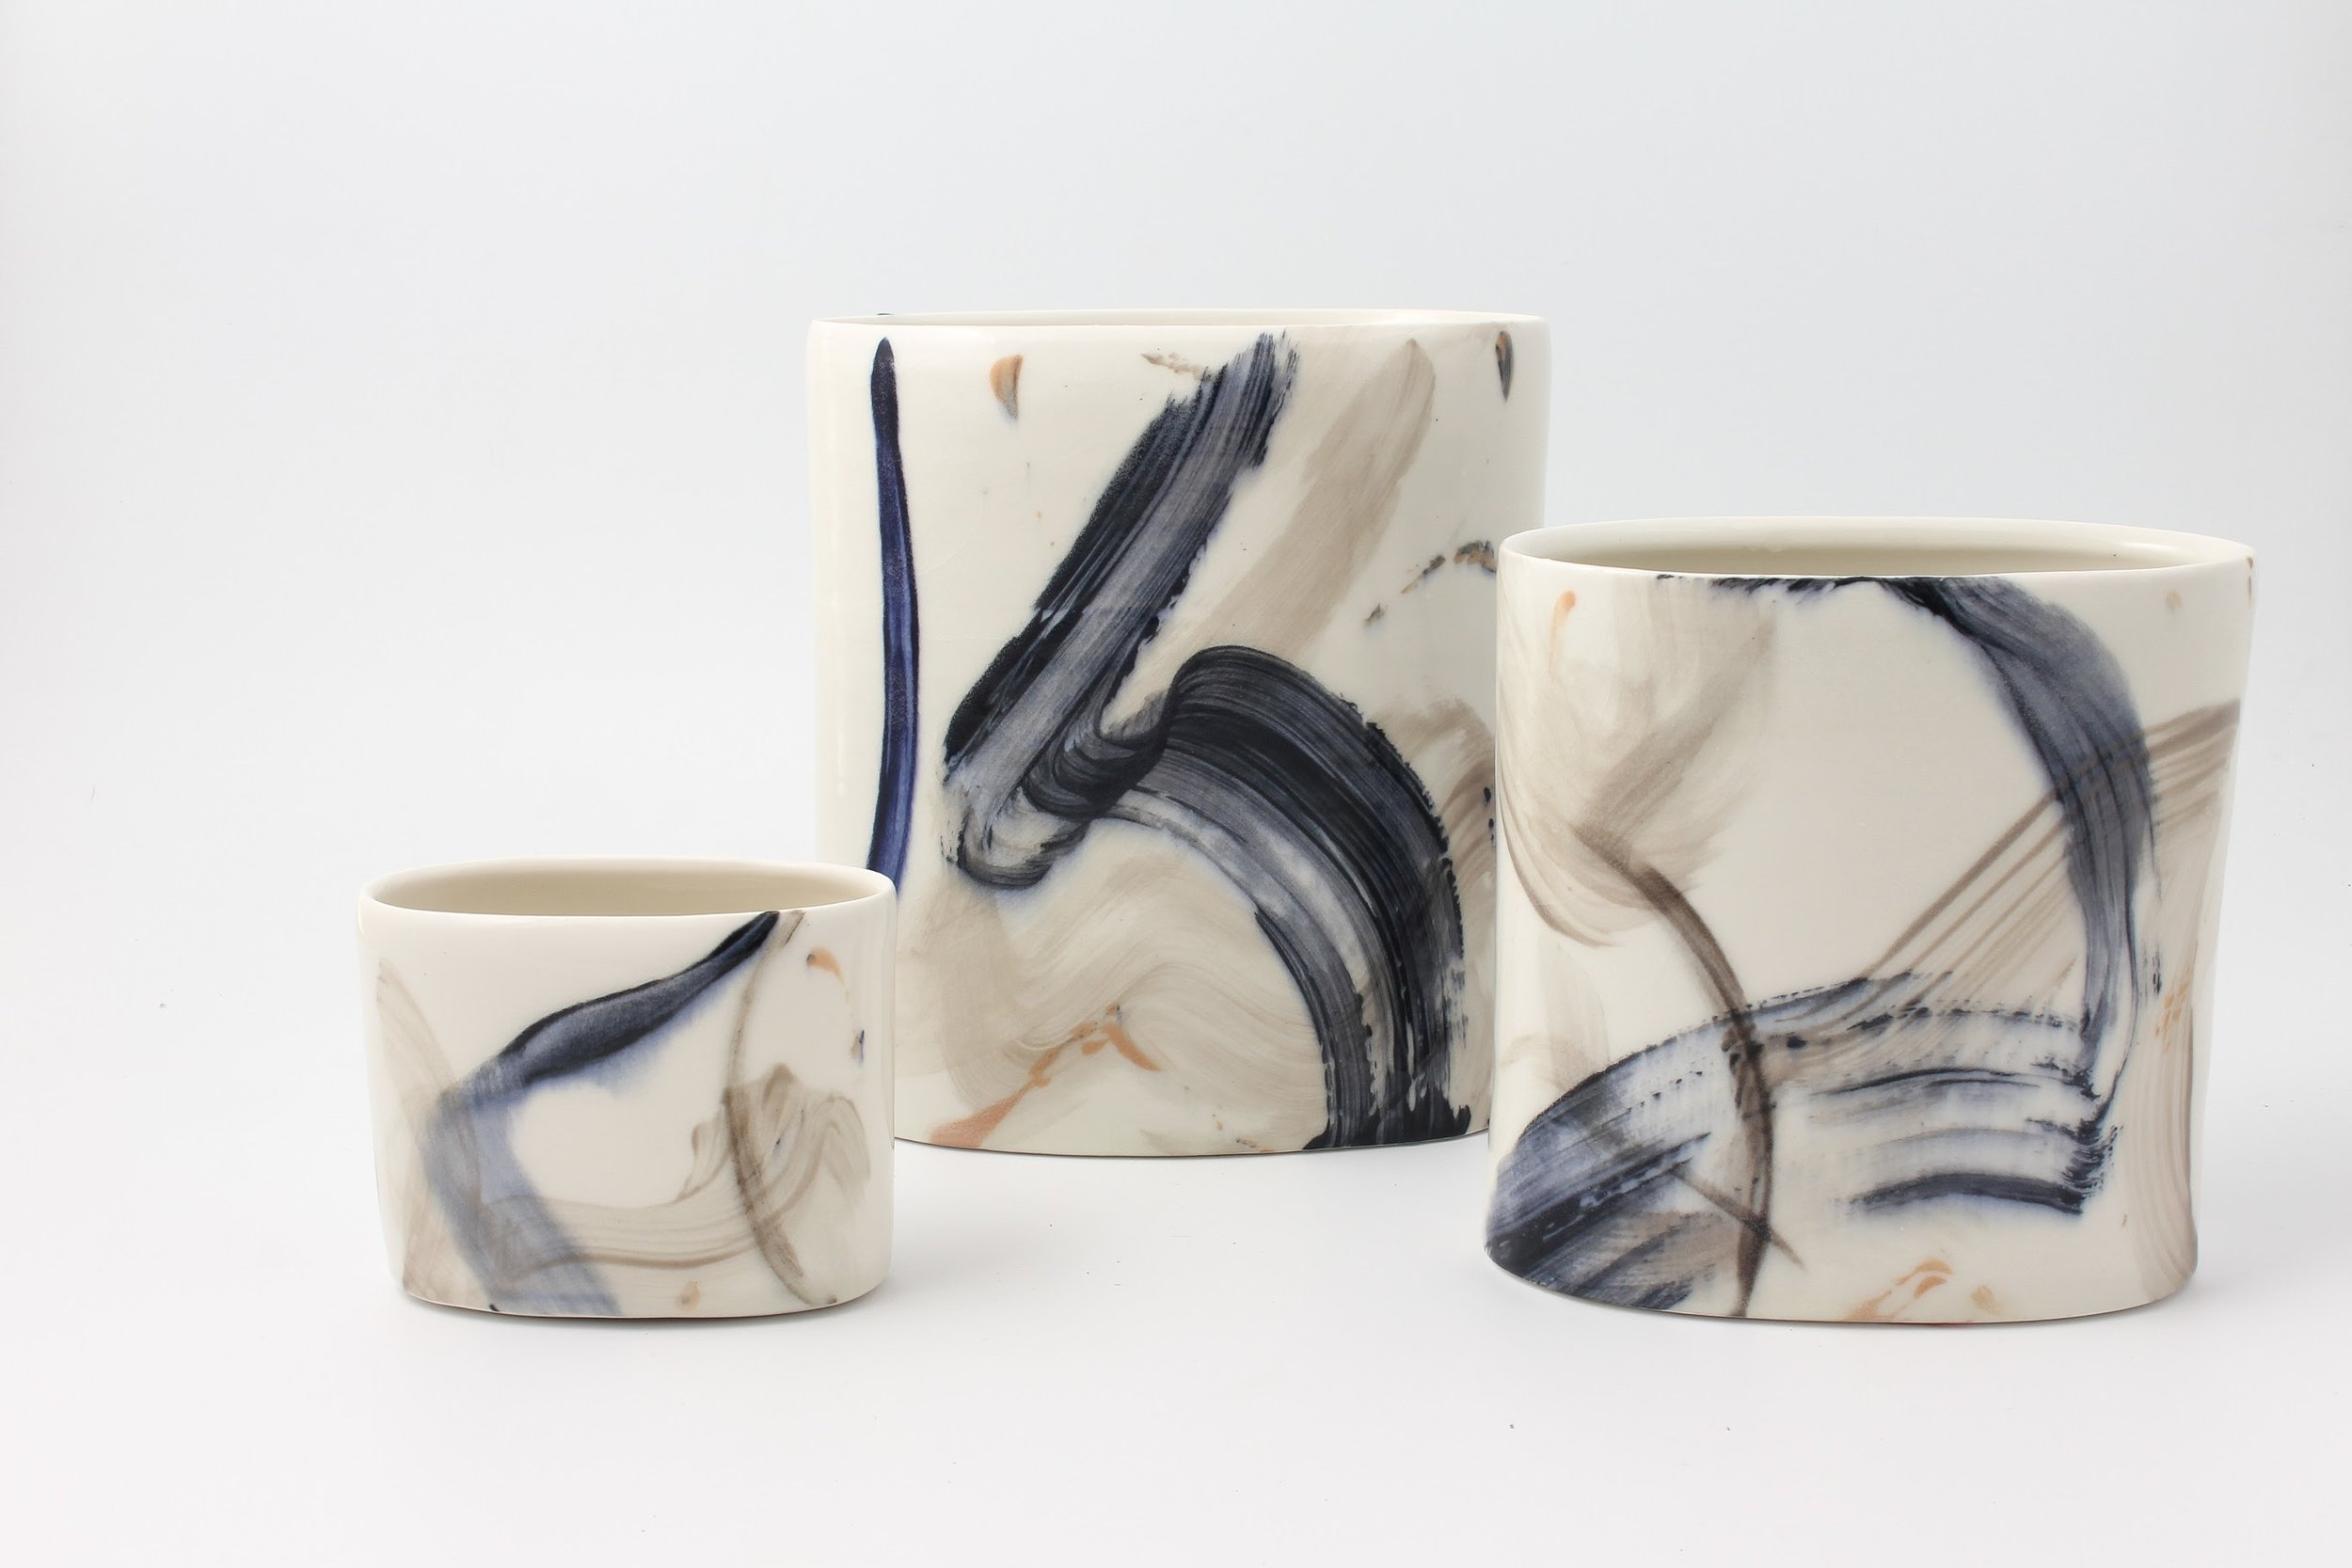 Chris_Crawford_Wheel_Thrown_Vases.jpeg